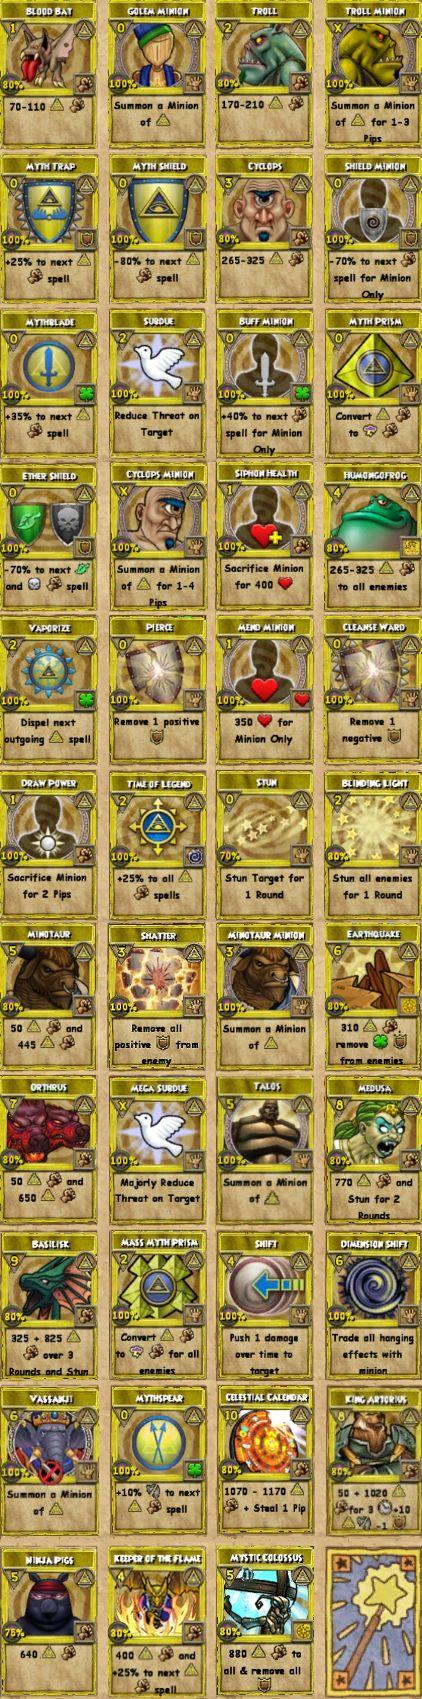 all myth wizard spells wizard 101 pinterest wizards